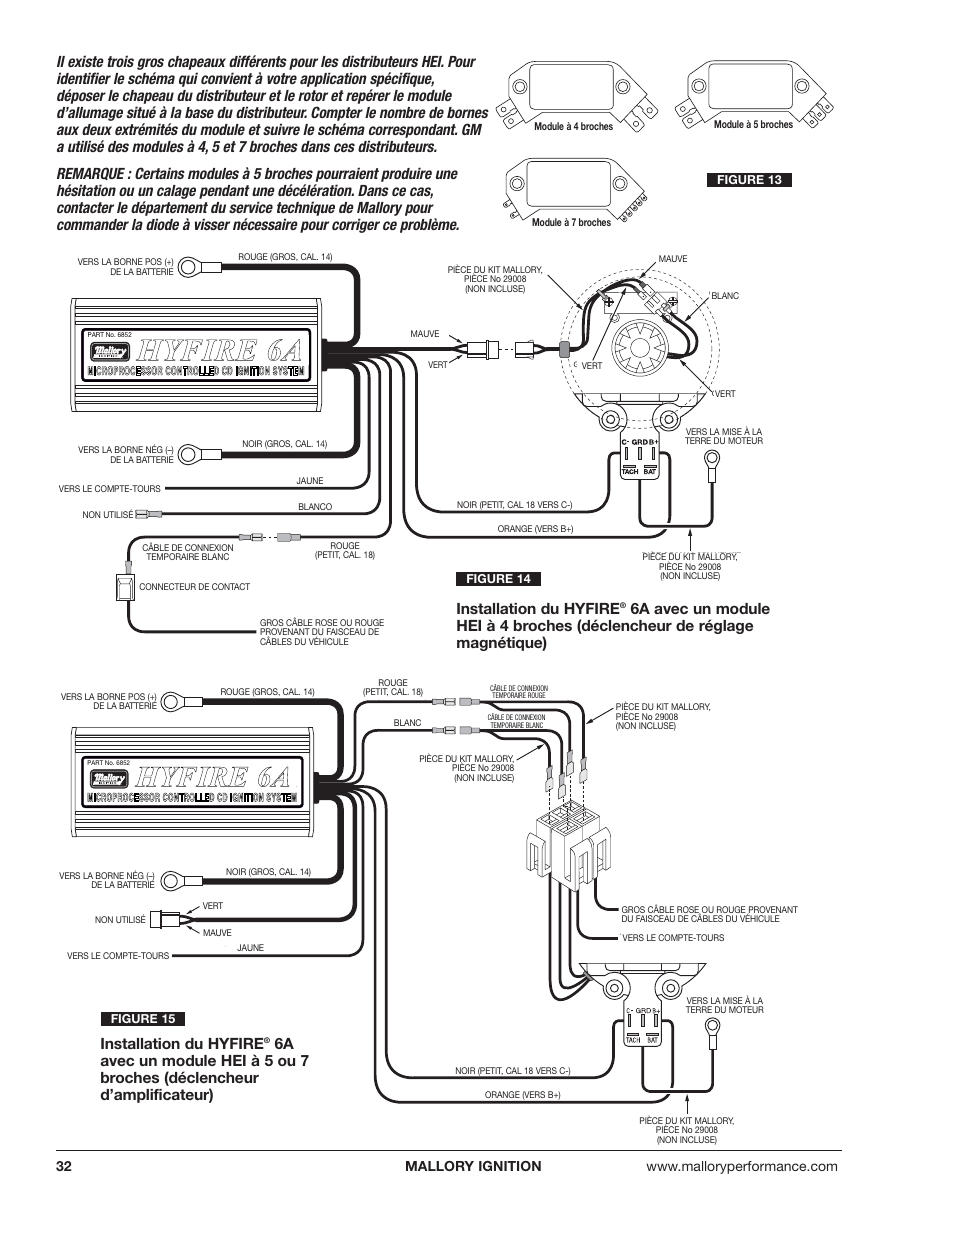 Mallory 6a Ignition Wiring Diagram | Wiring Diagram Echo on mallory battery, mallory resistors, mallory furniture, mallory gauges, mallory electronics,